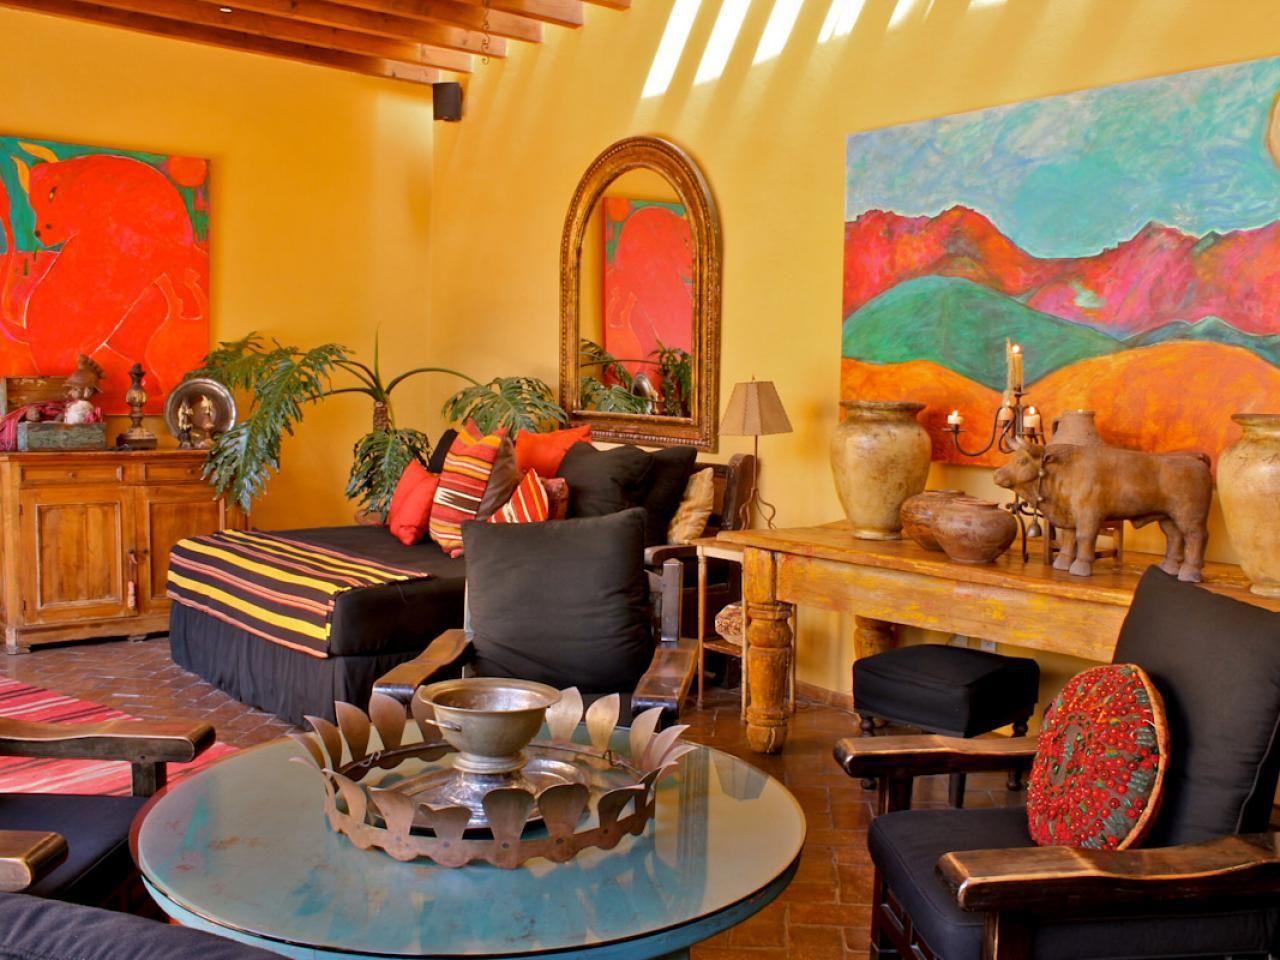 Mexican Style Home Decor Carole Meyer Mexican Outdoor Living Room Mexican Living Rooms Mexican Style Homes Mexican Home Decor